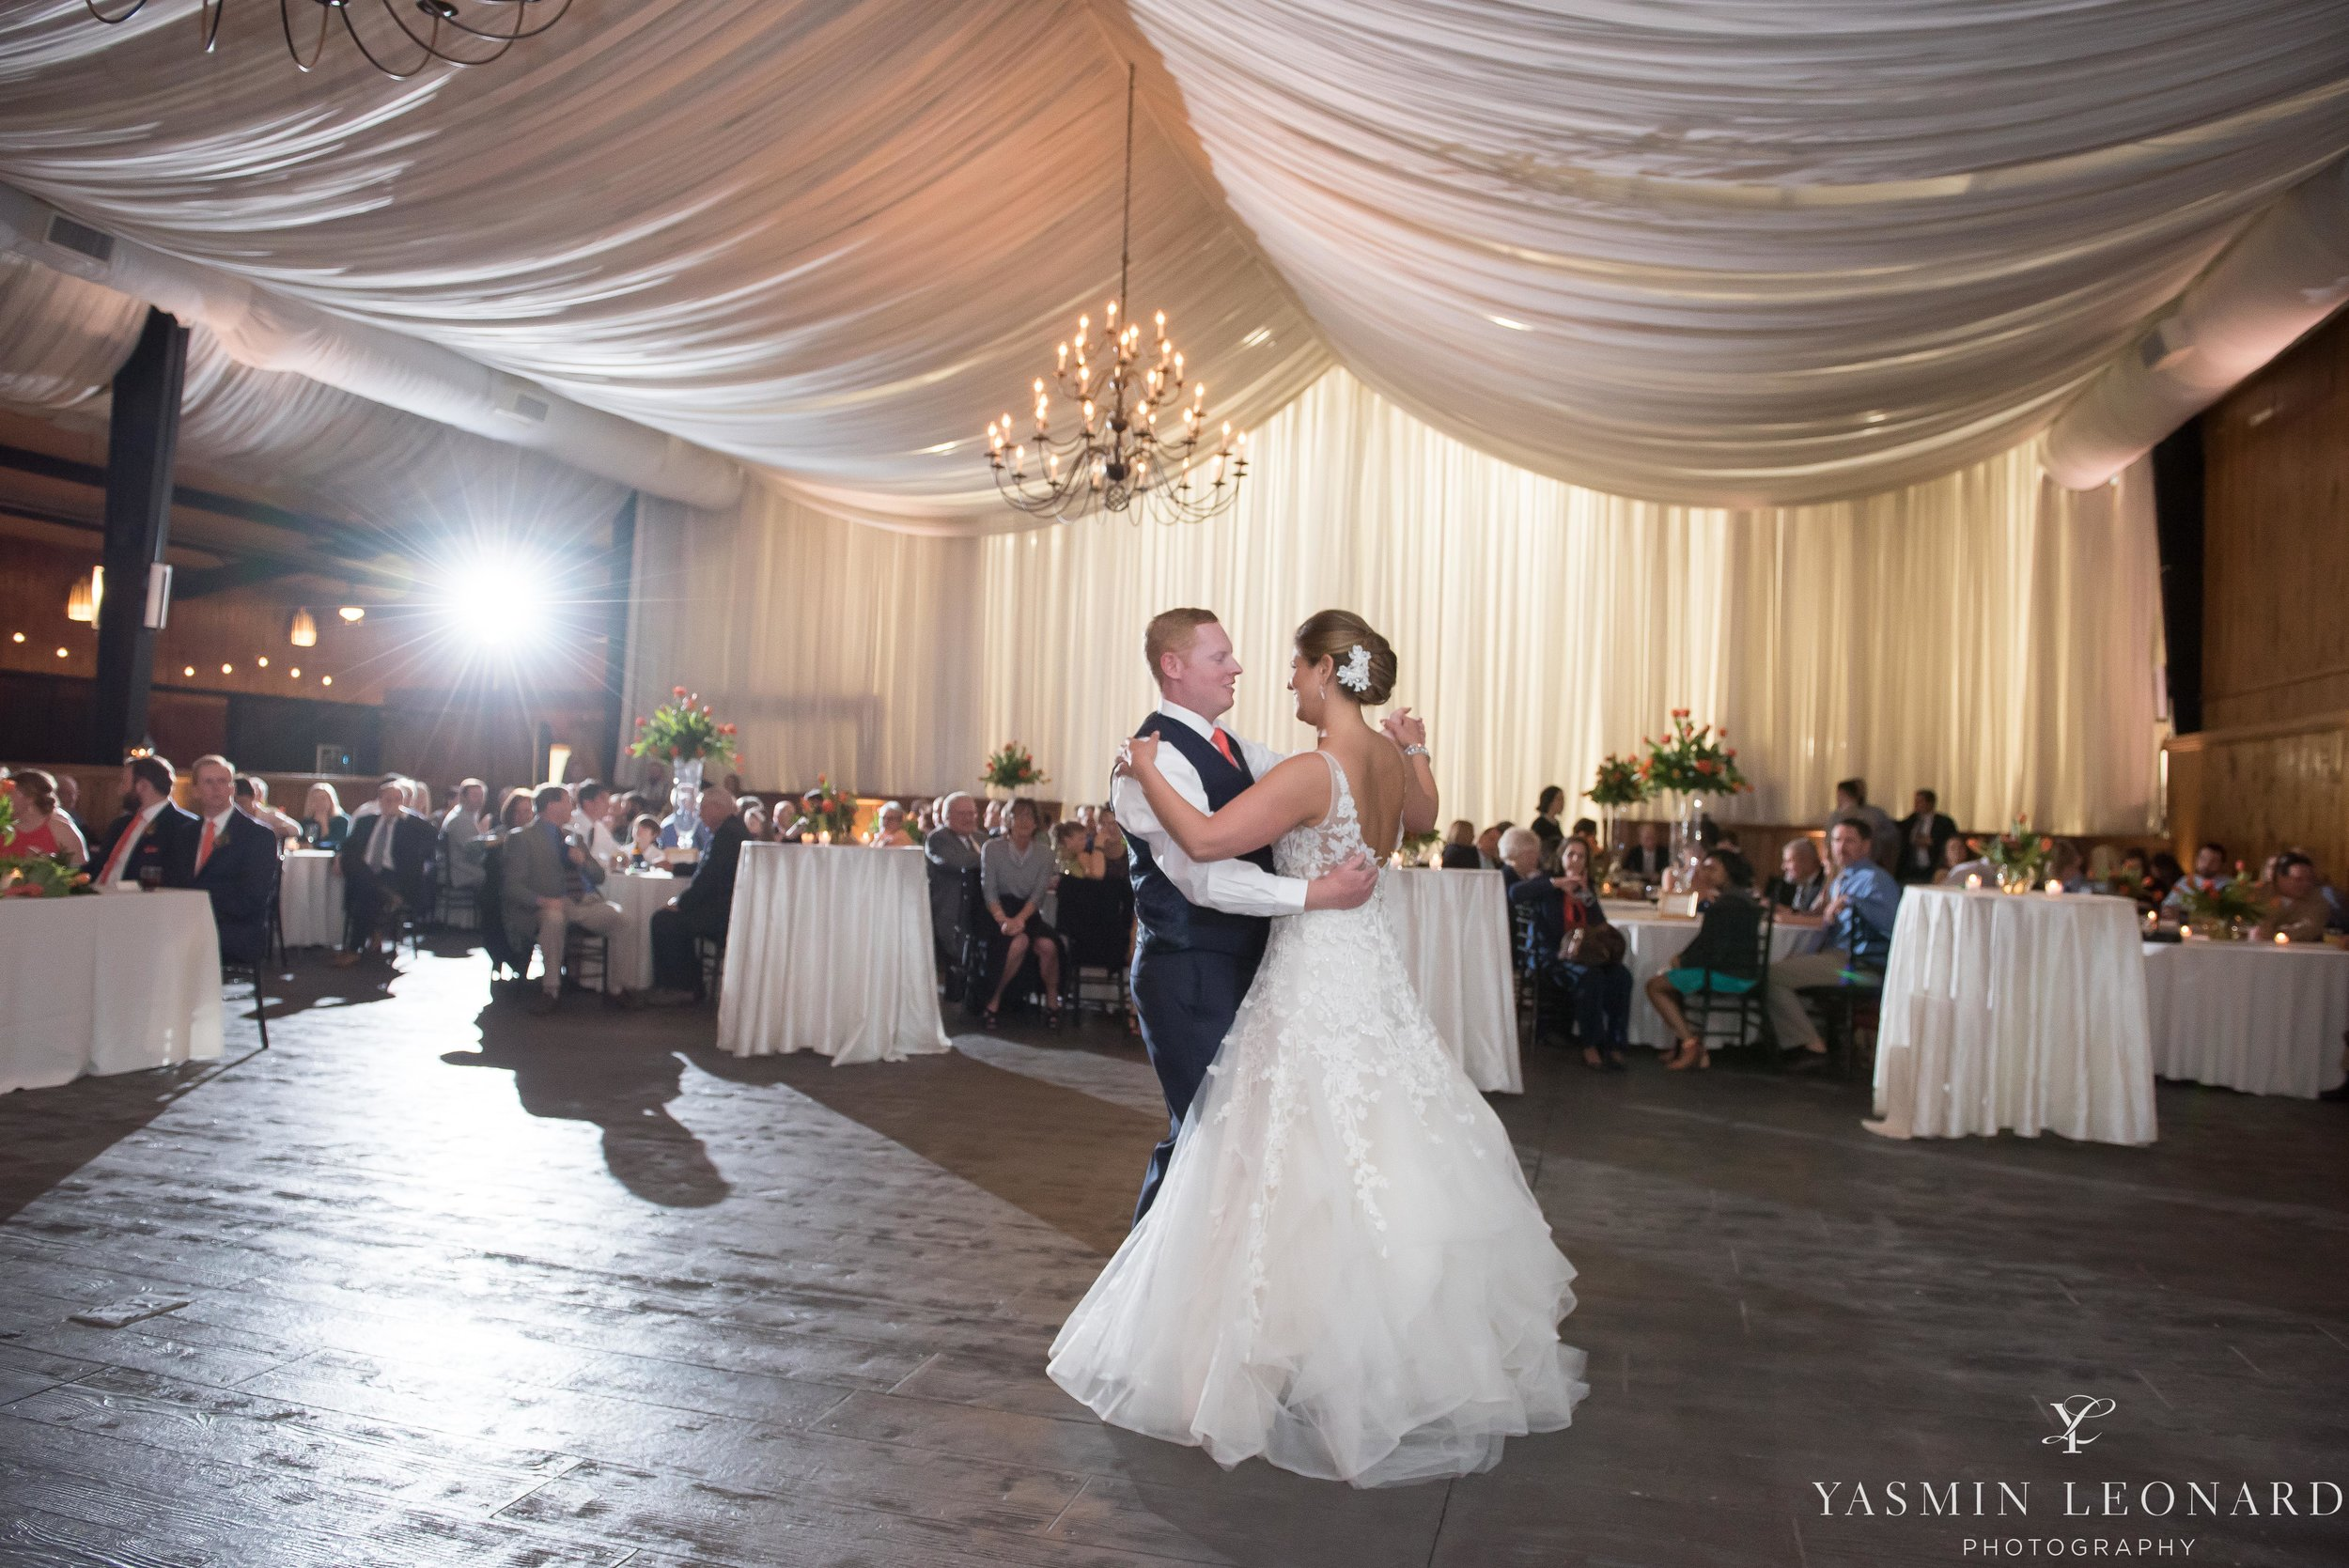 Adaumont Farm - Adaumont Farm Weddings - Trinity Weddings - NC Weddings - Yasmin Leonard Photography-62.jpg